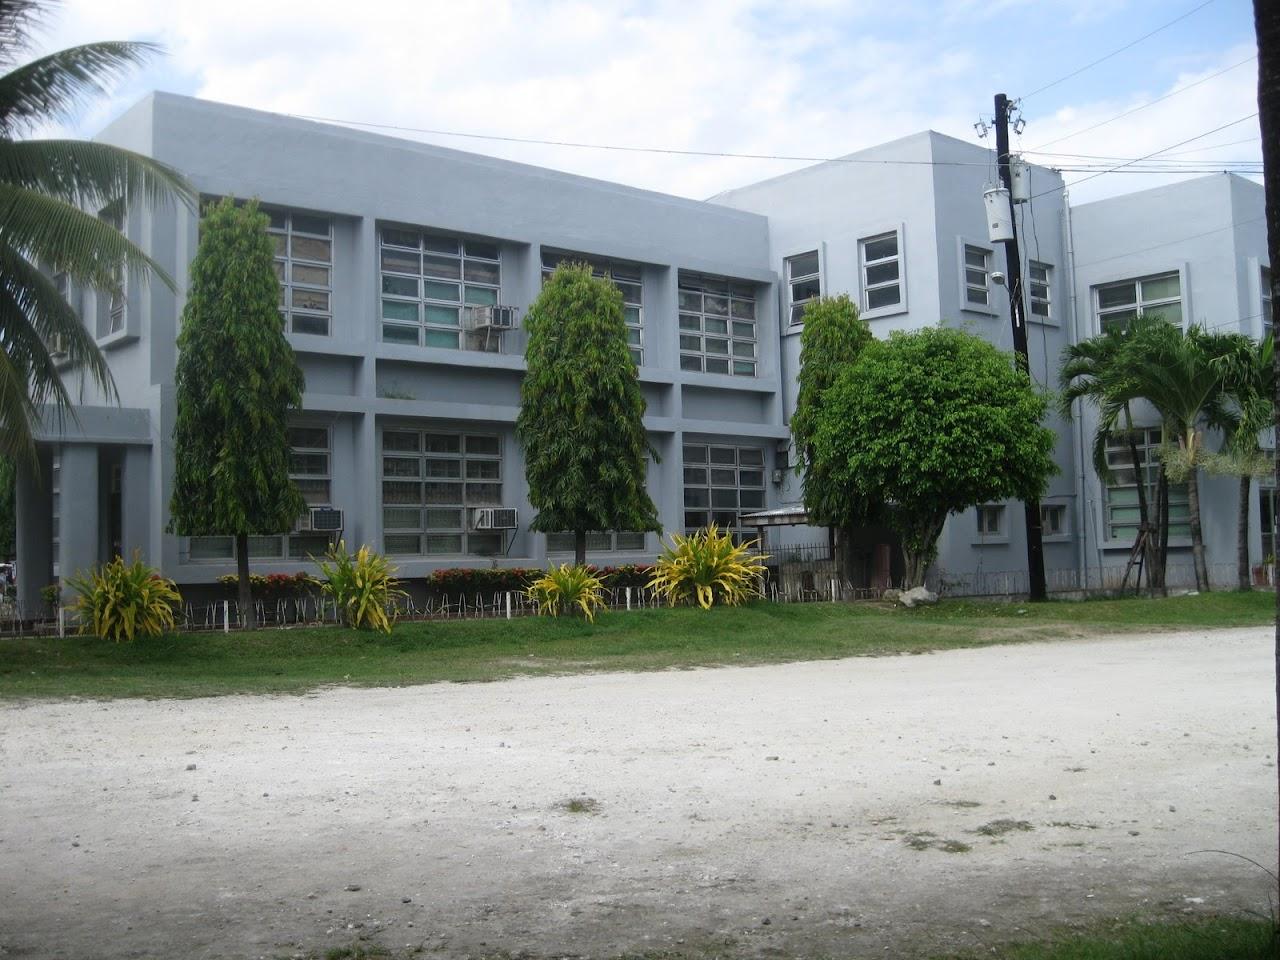 [Danao-City-Hall-and-Plaza-2.JPG]